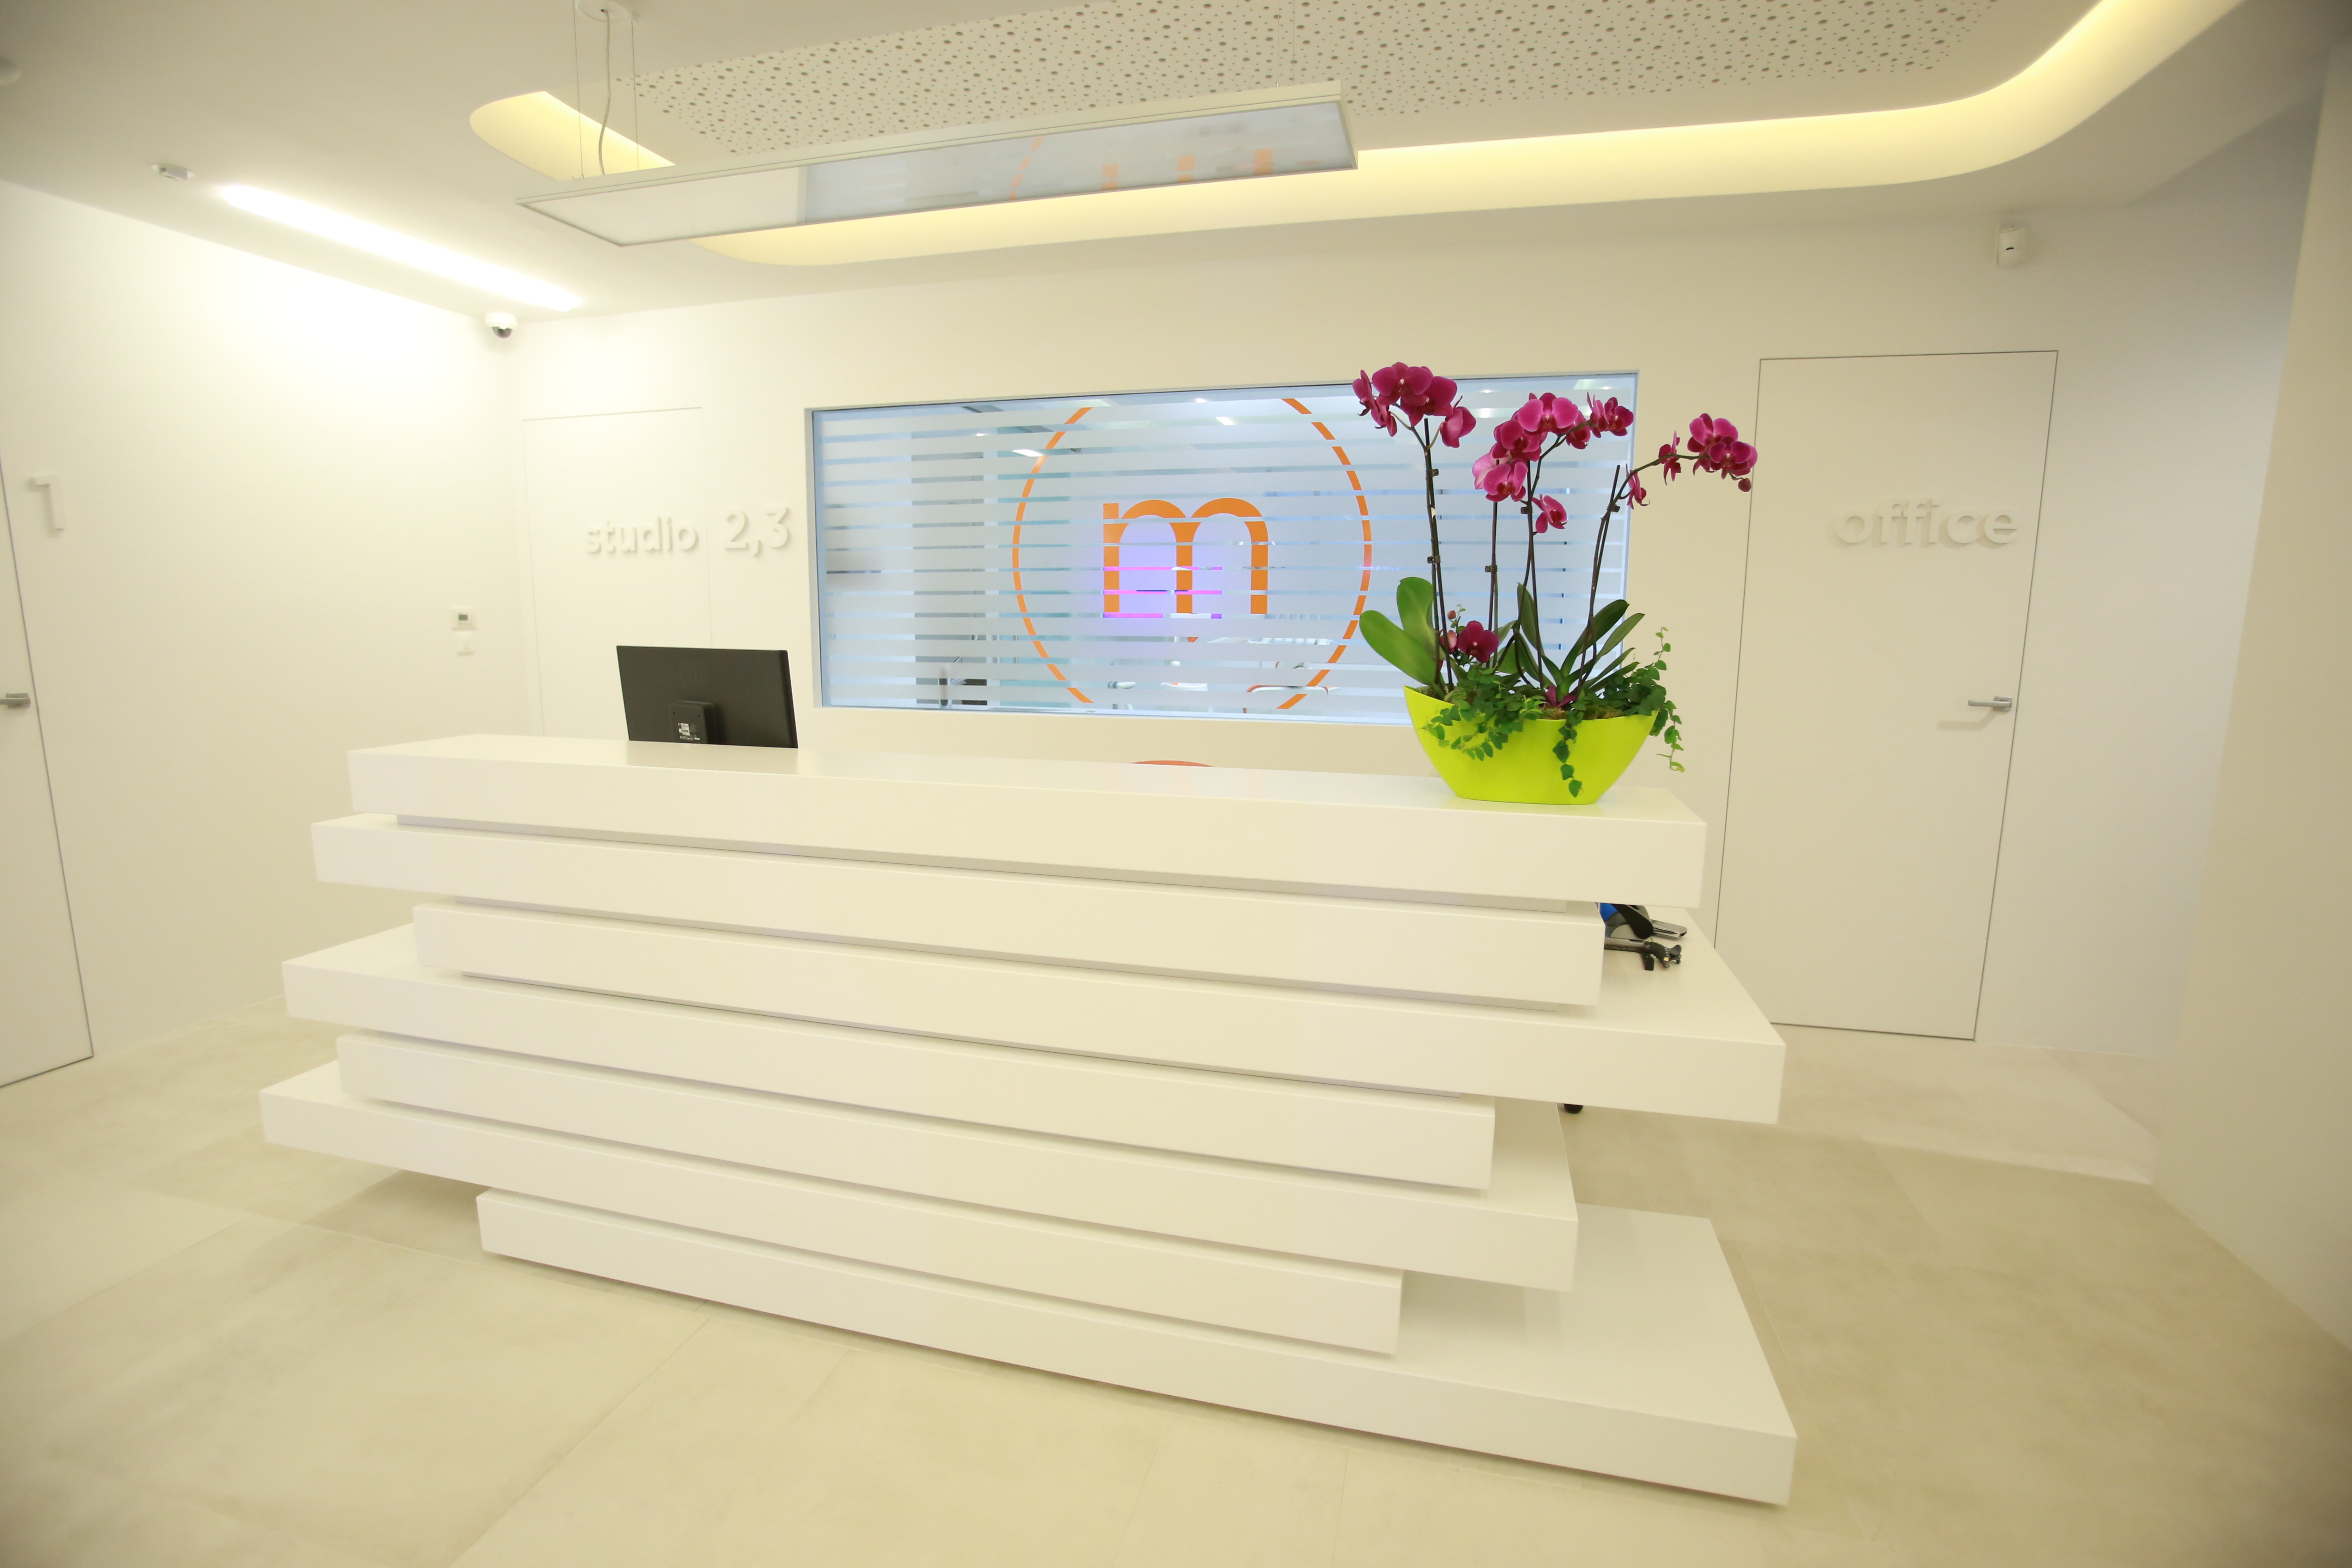 MR 2 - Ortodoncija Marelic 10